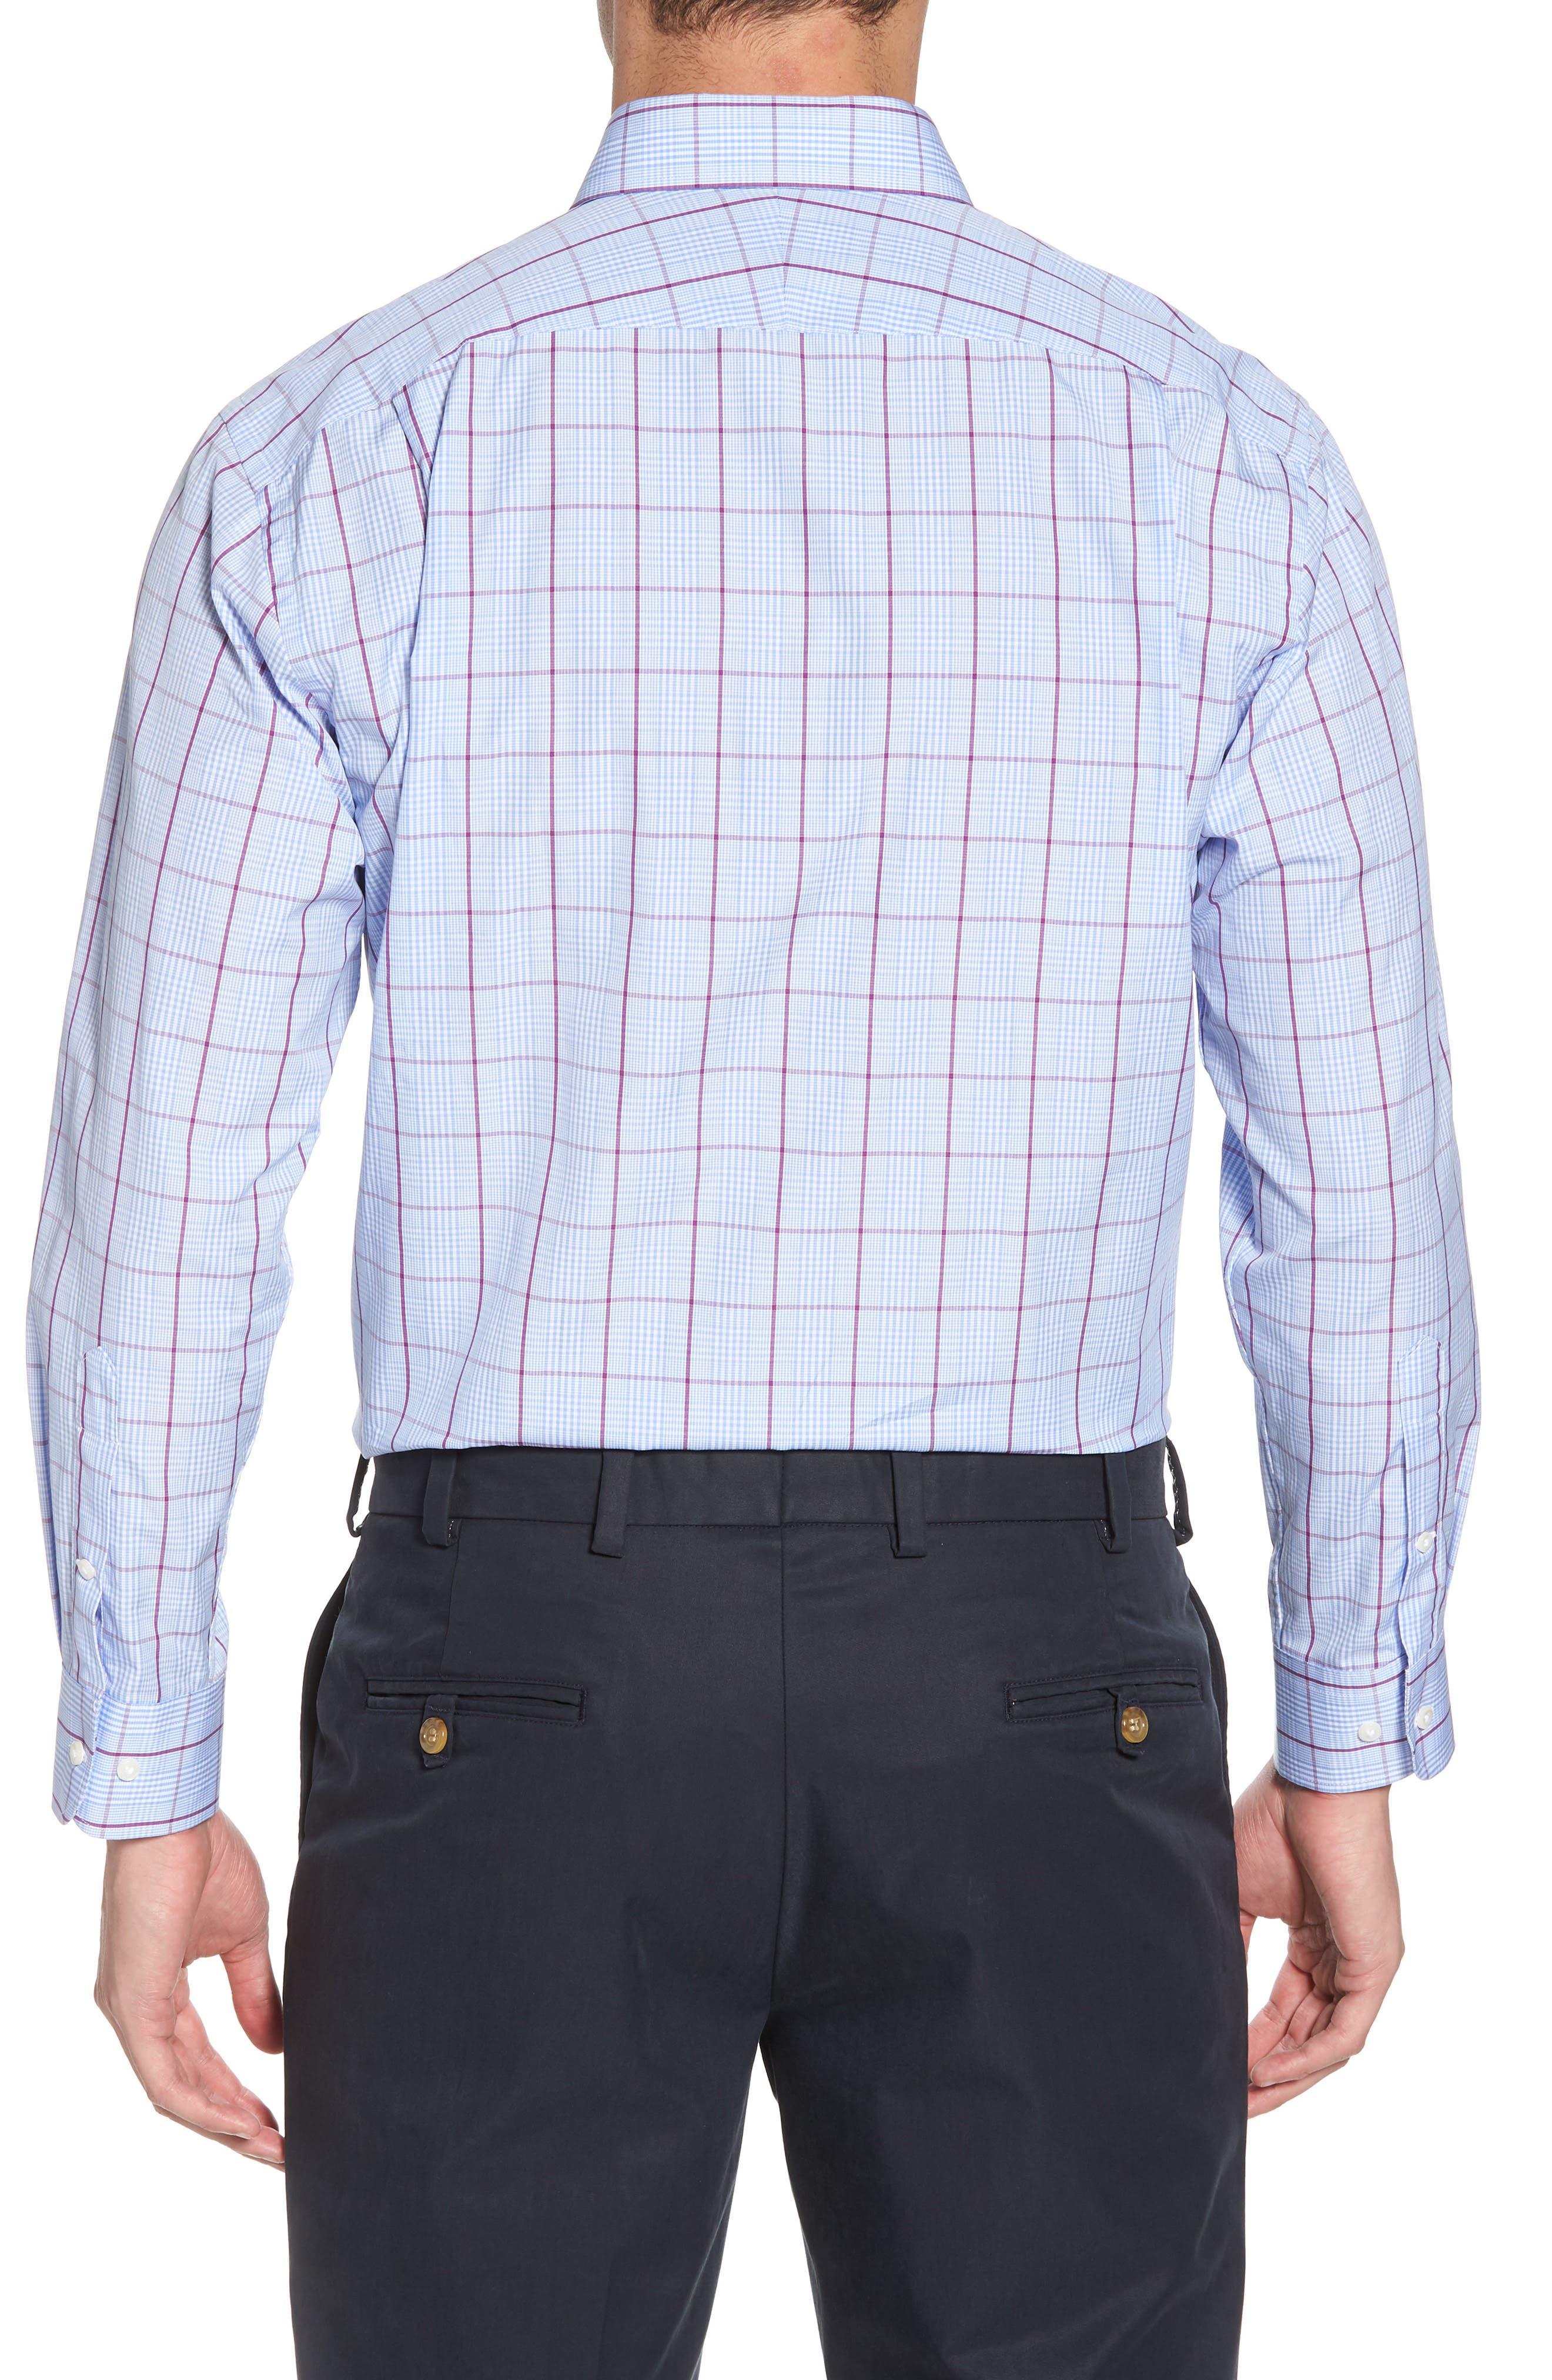 Alternate Image 2  - Nordstrom Men's Shop Traditional Fit Plaid Dress Shirt